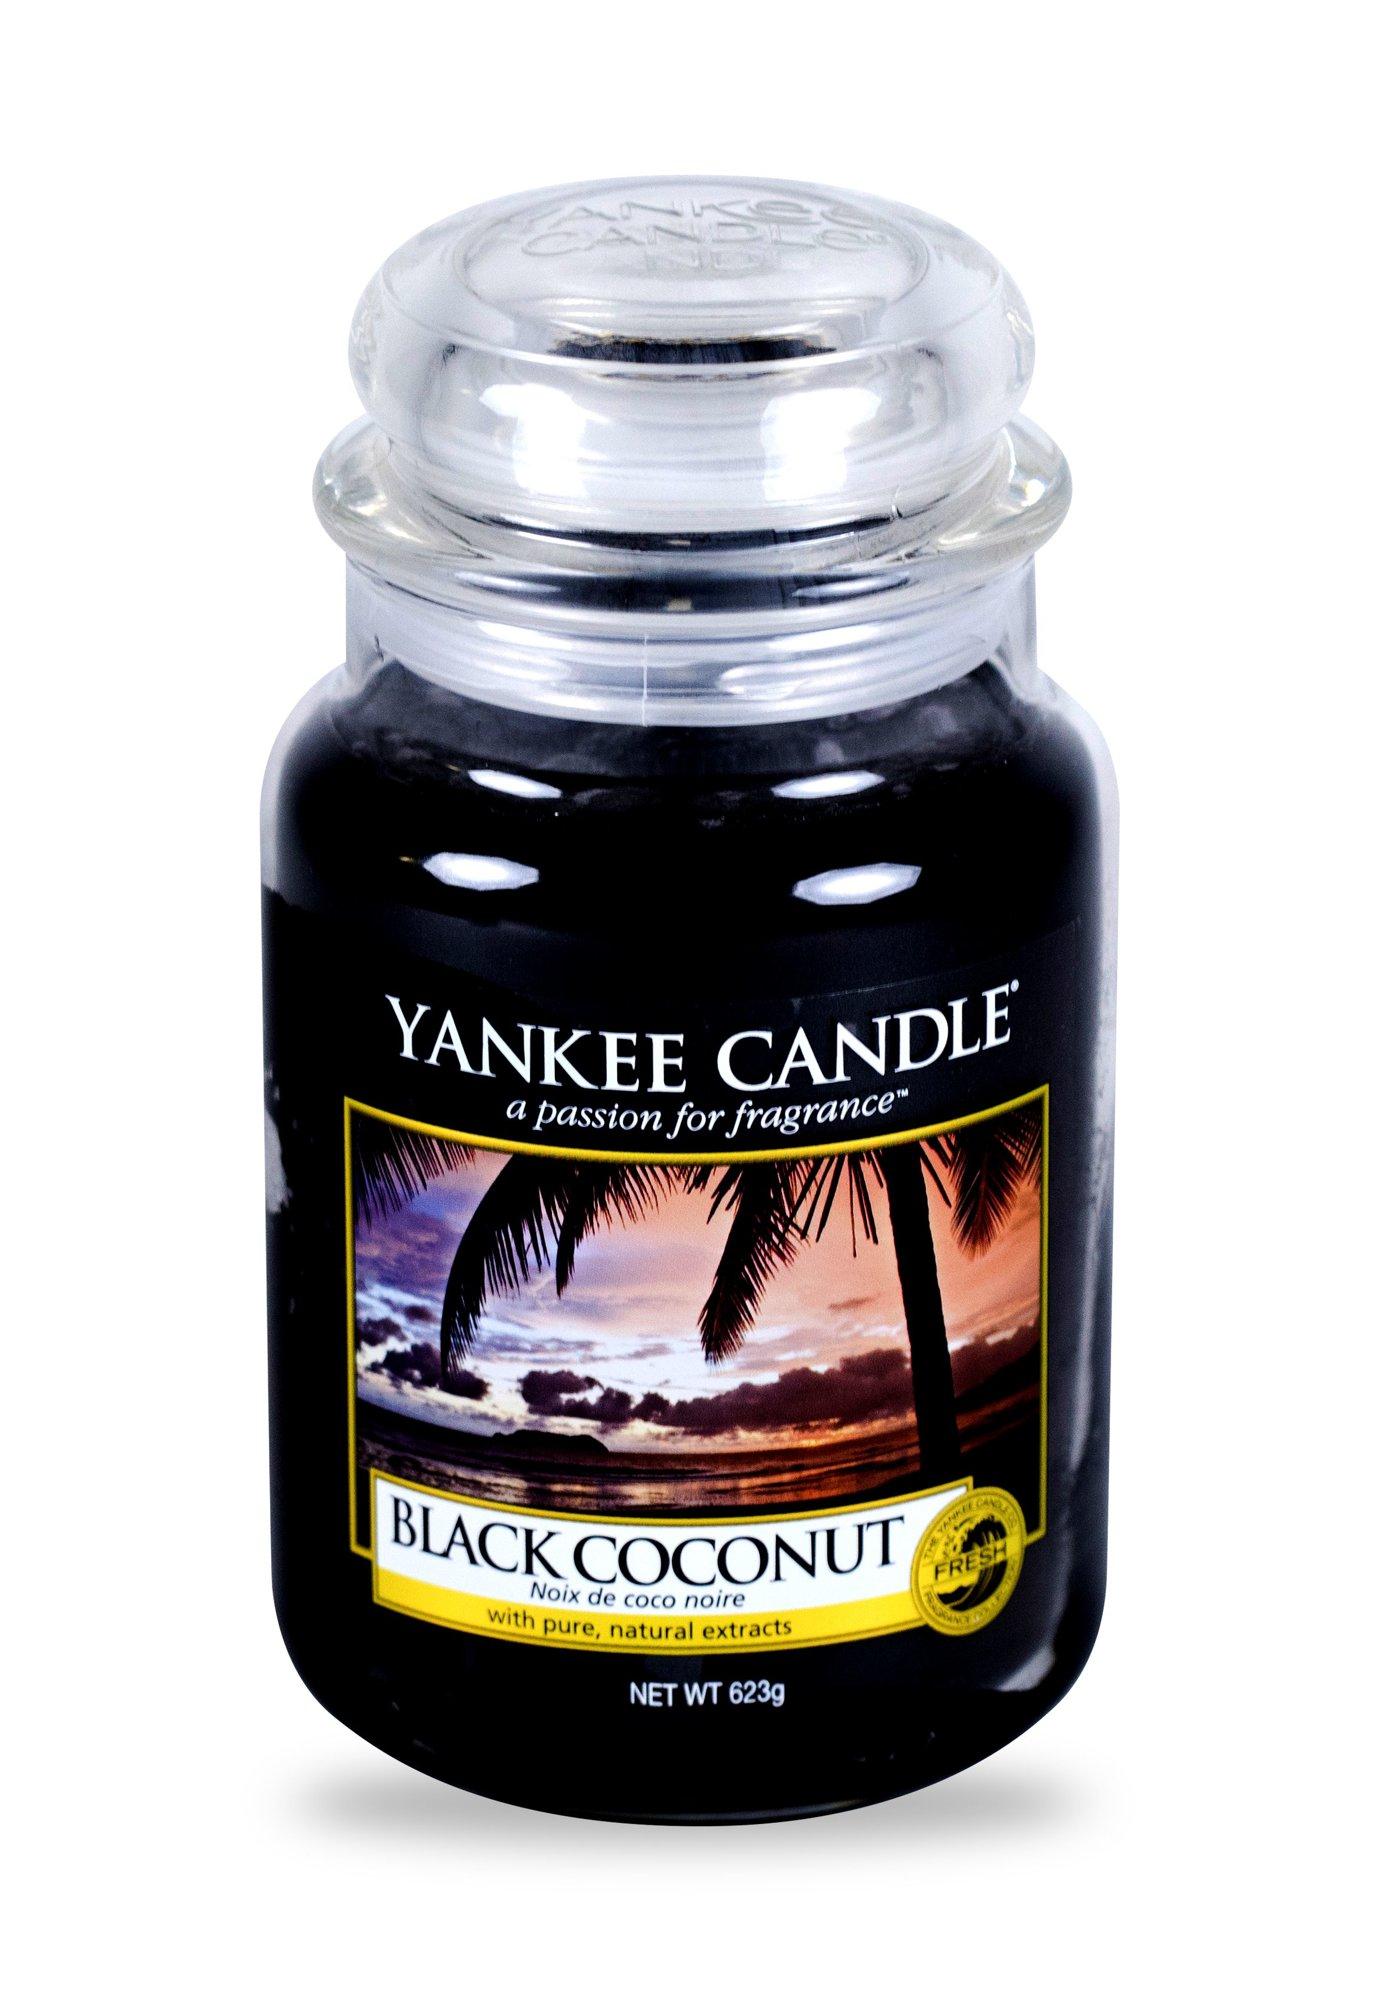 Kvepalai Yankee Candle Black Coconut